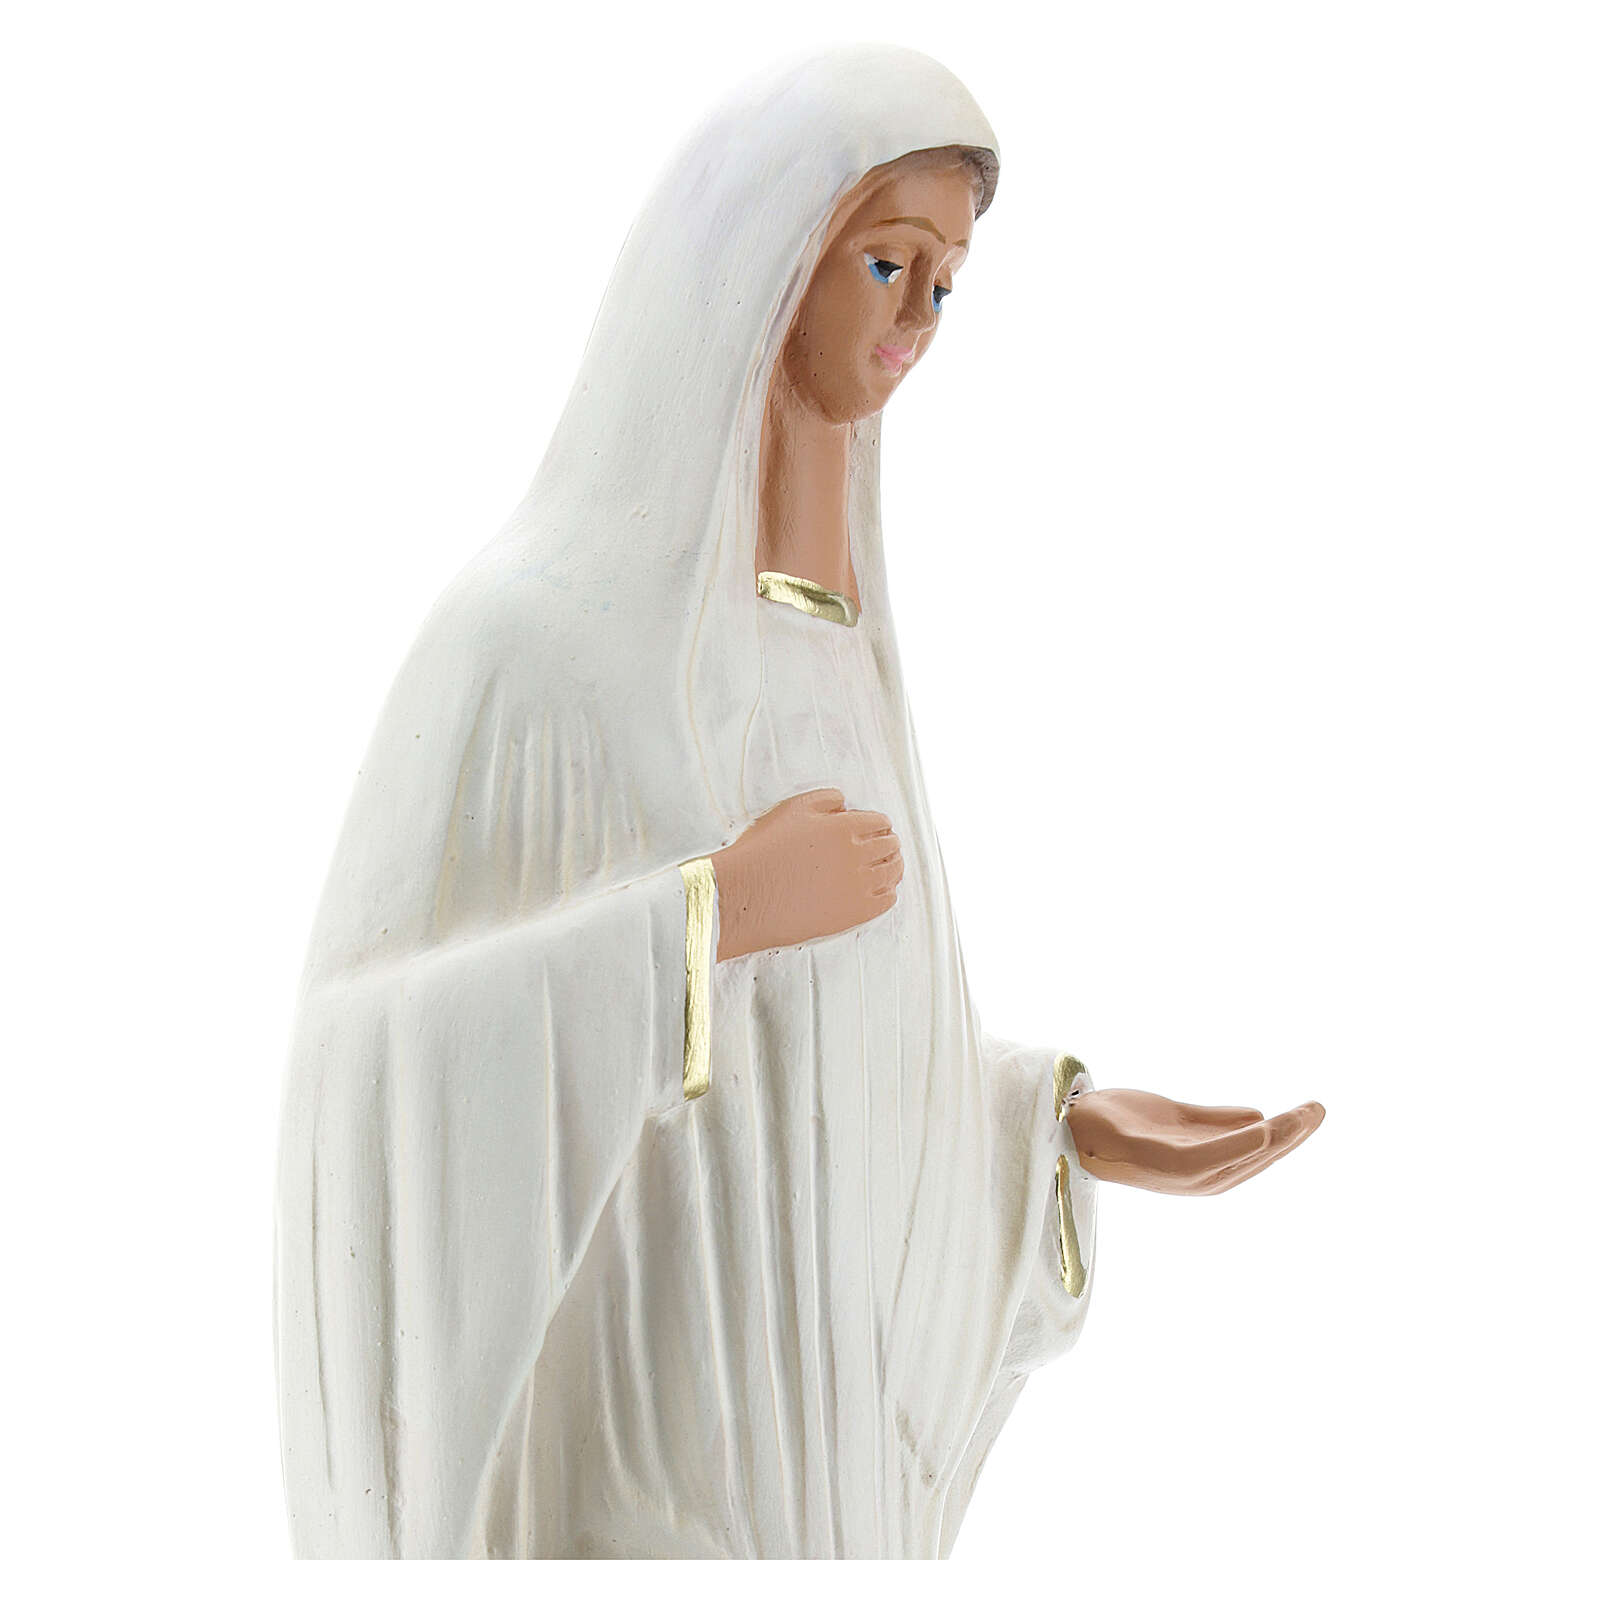 Statue of Our Lady of Medjugorje 30 cm painted plaster Arte Barsanti 4